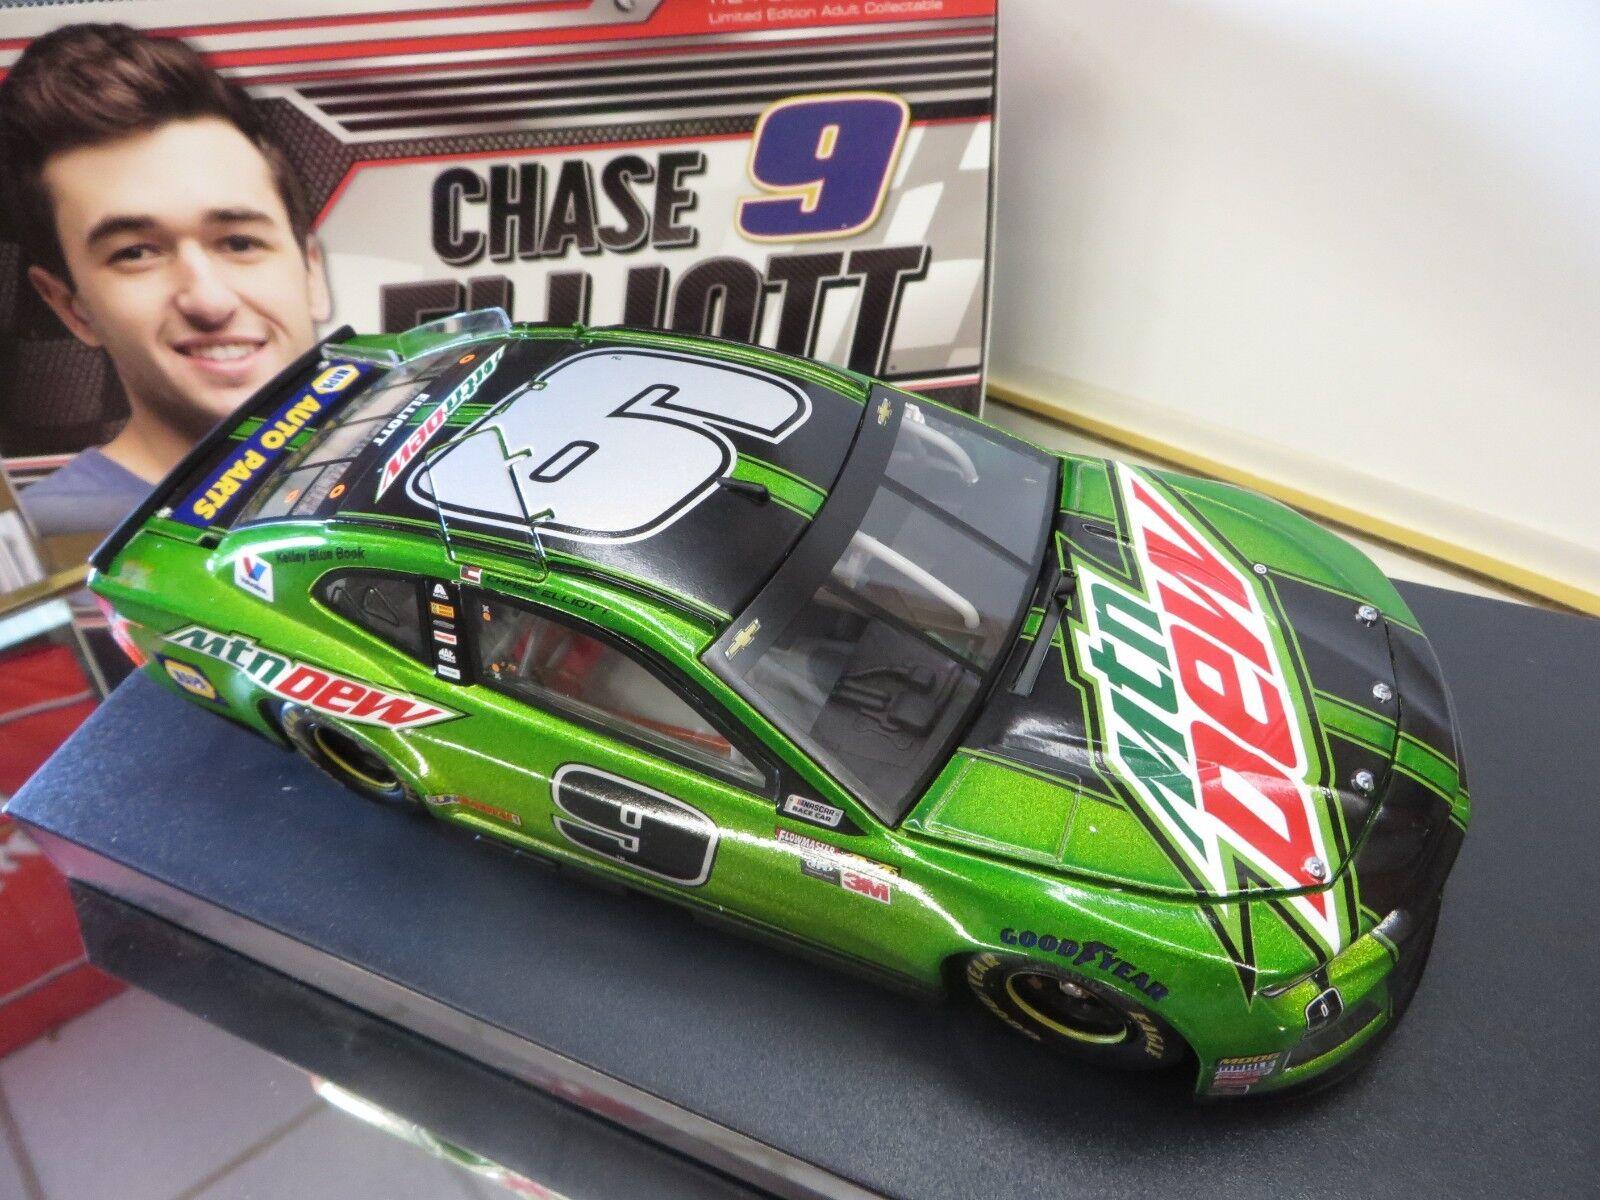 CHASE ELLIOTT 2018 MOUNTAIN DEW CHEVY CAMARO 1 24 24 24 ACTION NASCAR DIECAST 5e11ec